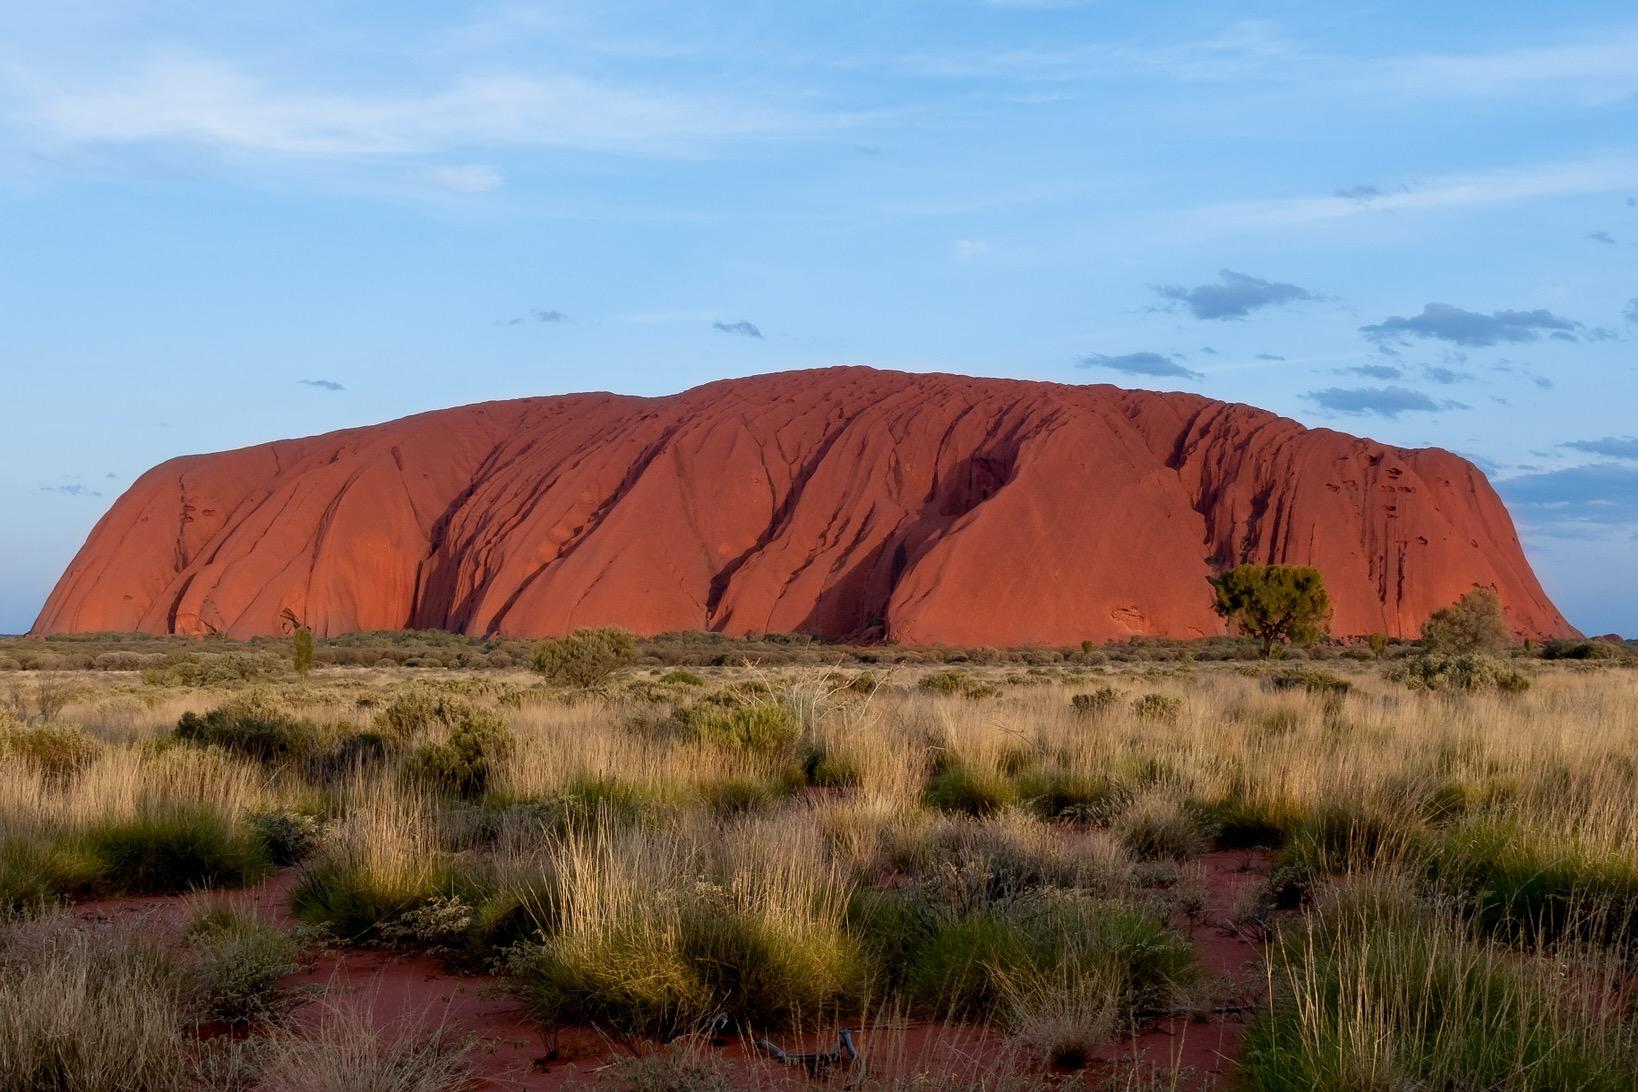 Der Uluru strahl auch im Februar ohne Ende